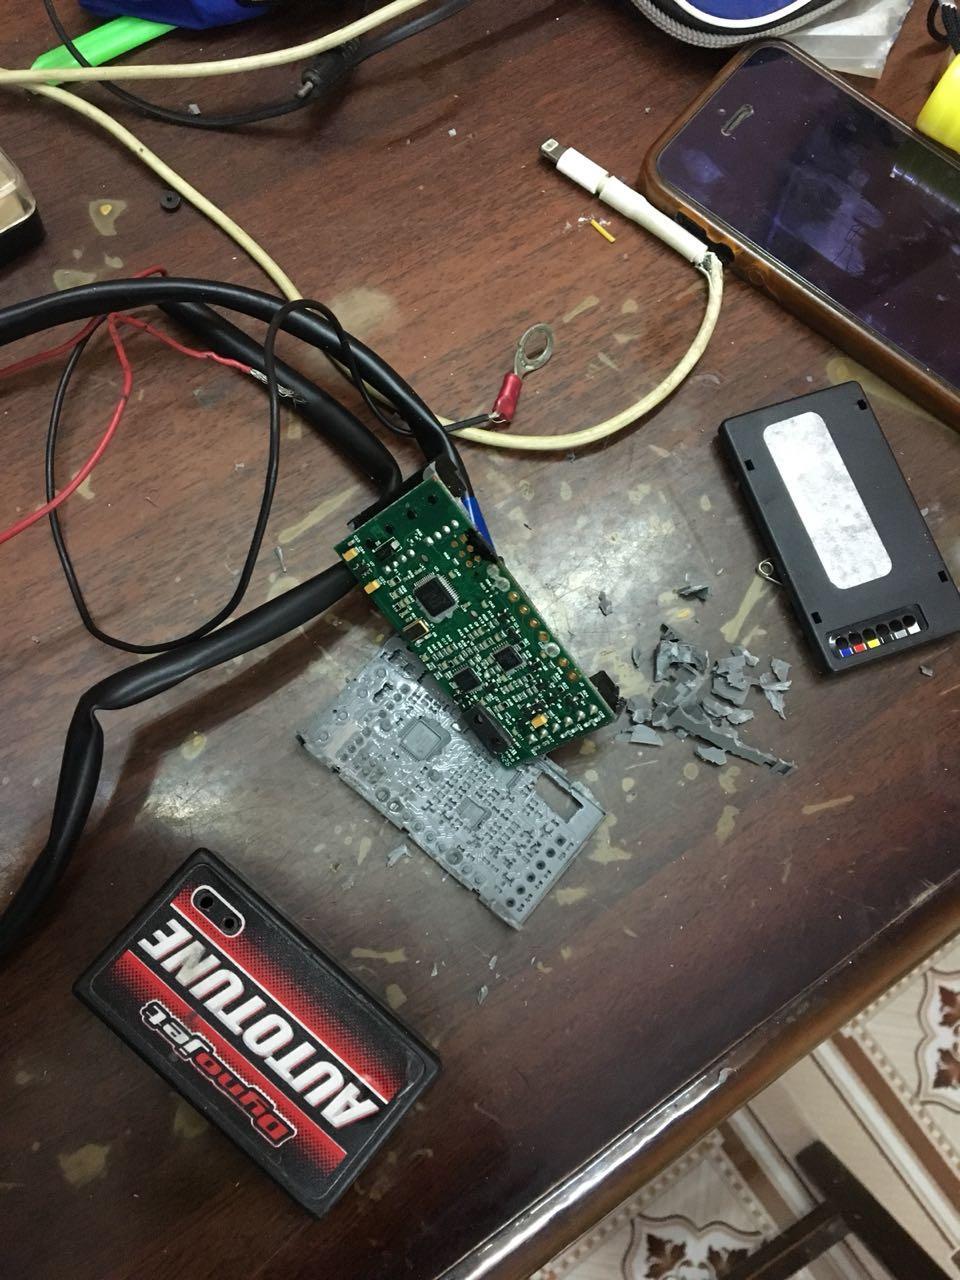 Dynojet Autotune Repair Burnt Diode S1g Electrical Vfrdiscussion Suzuki Bandit 1250 Wiring Diagram Whatsapp Image 2018 07 12 At 54135 Pmjpeg